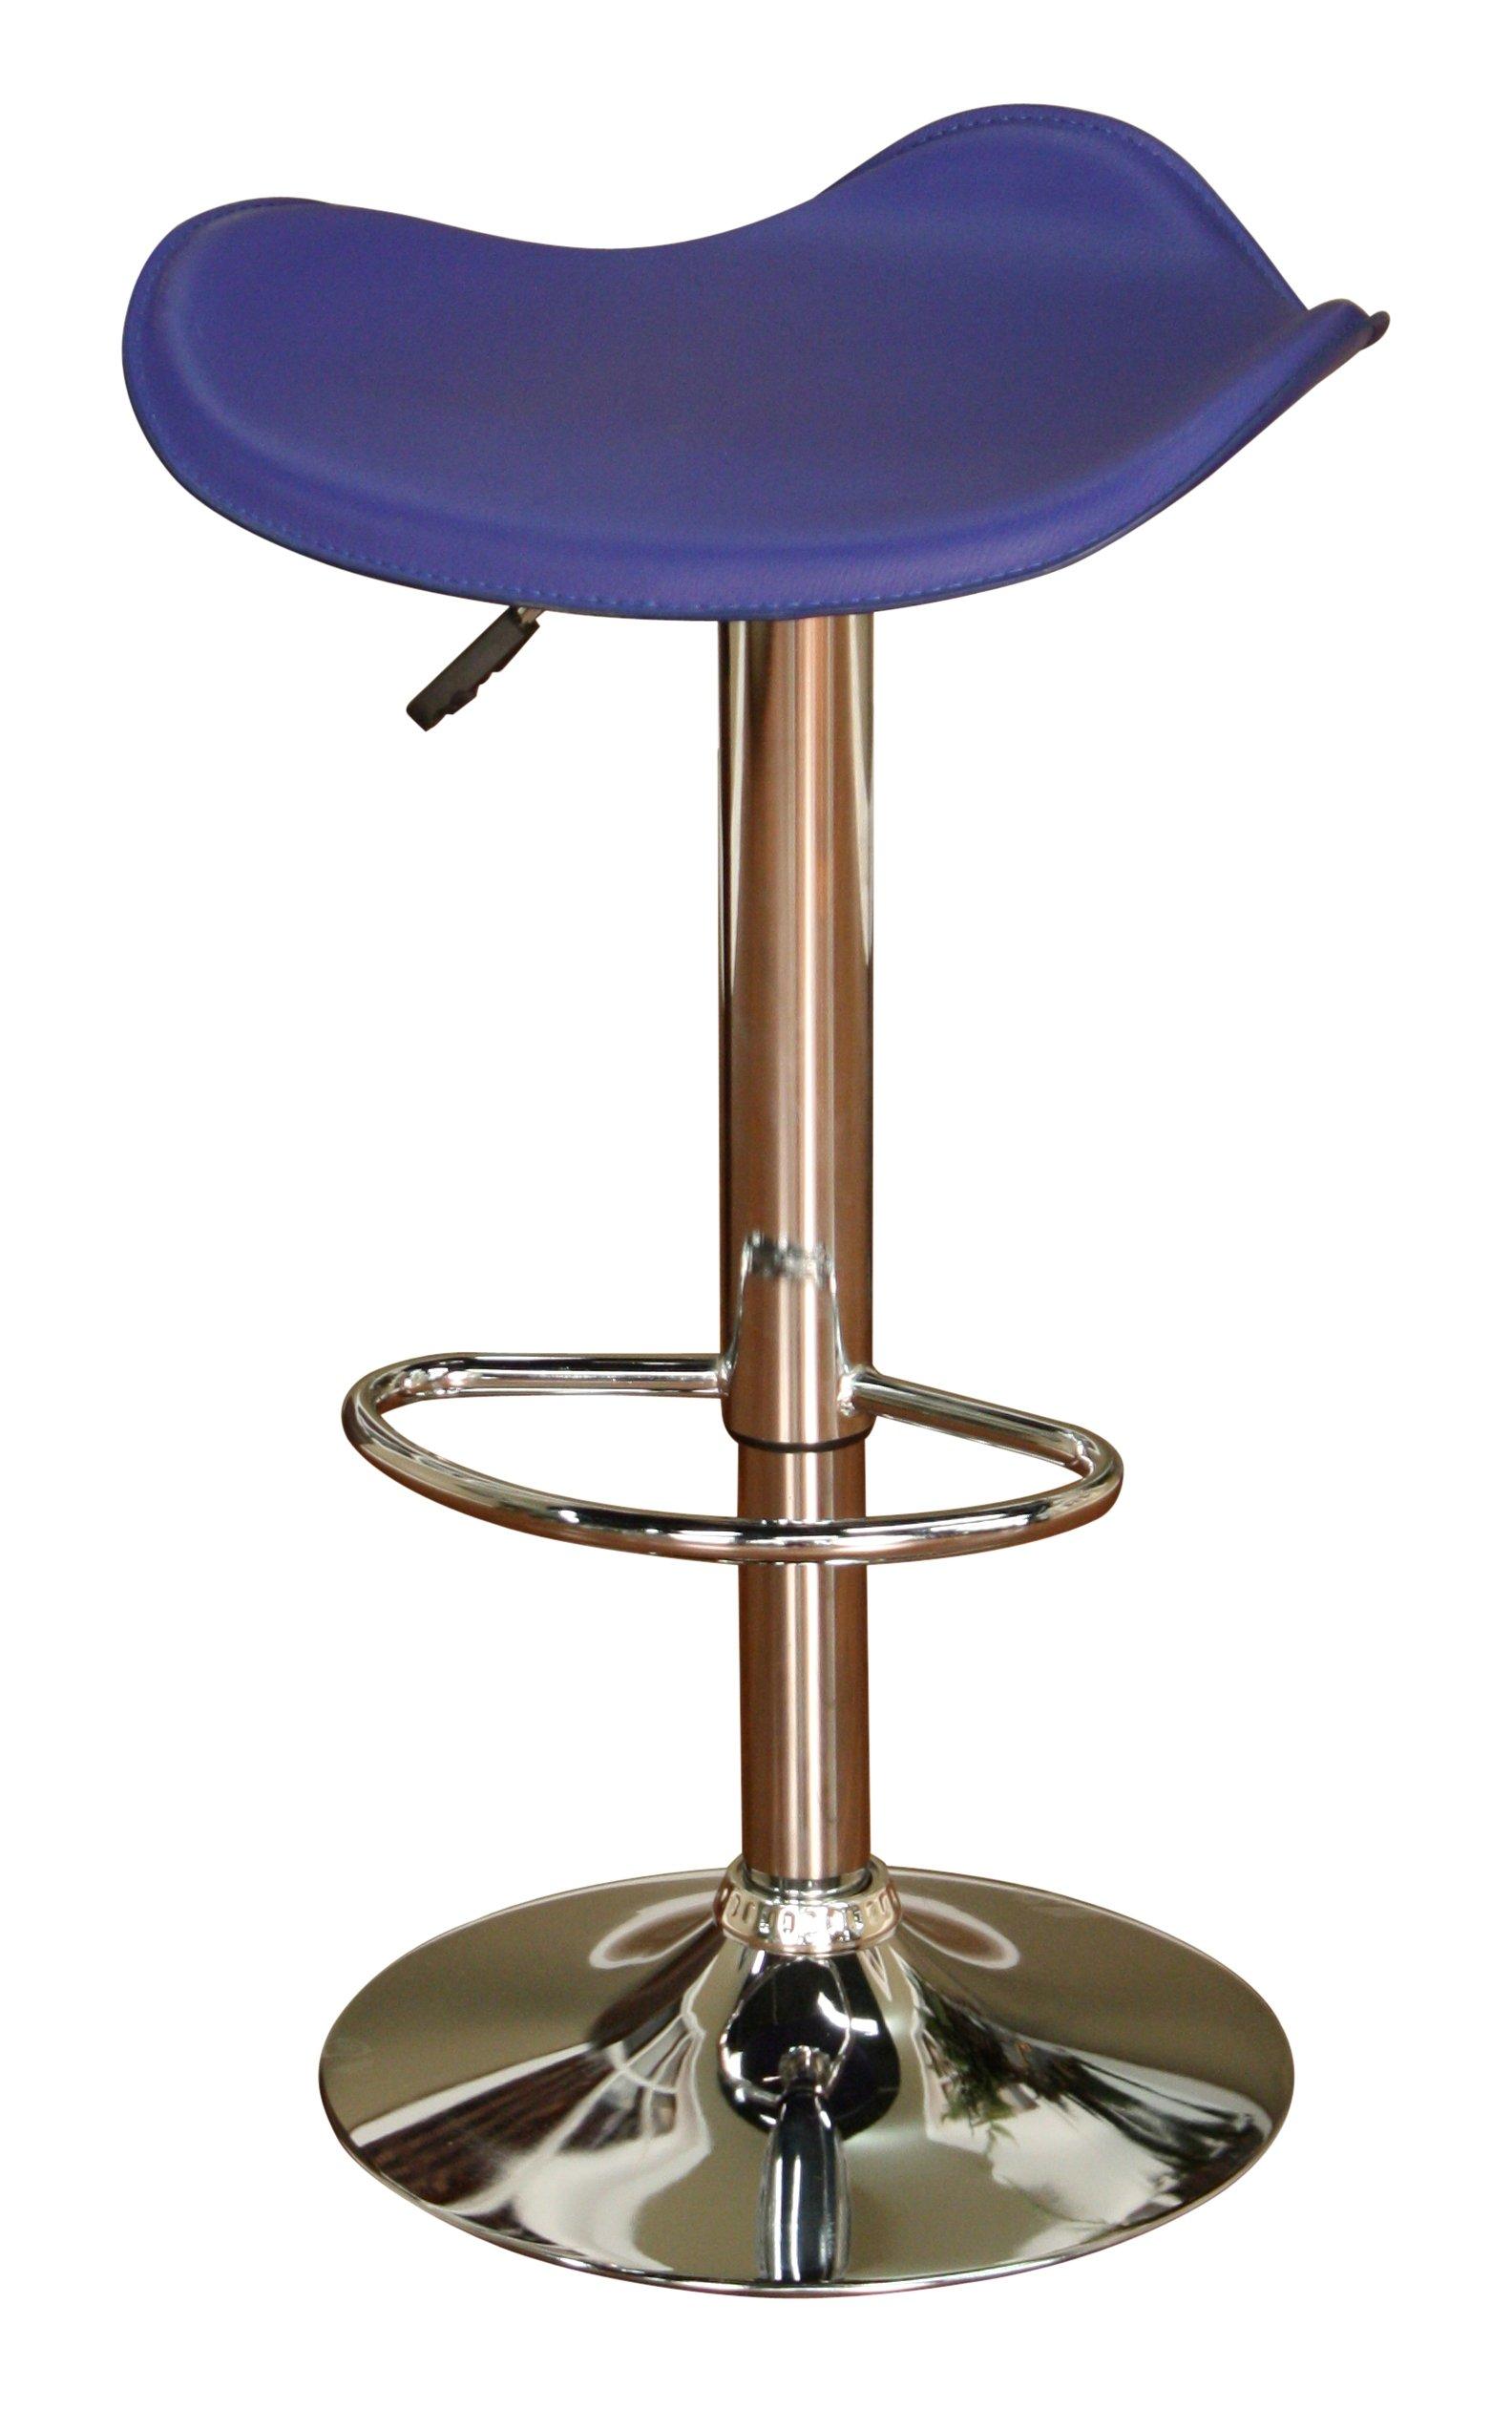 American Heritage Billiards Sloan Adjustable Height Stool with Blue Seat